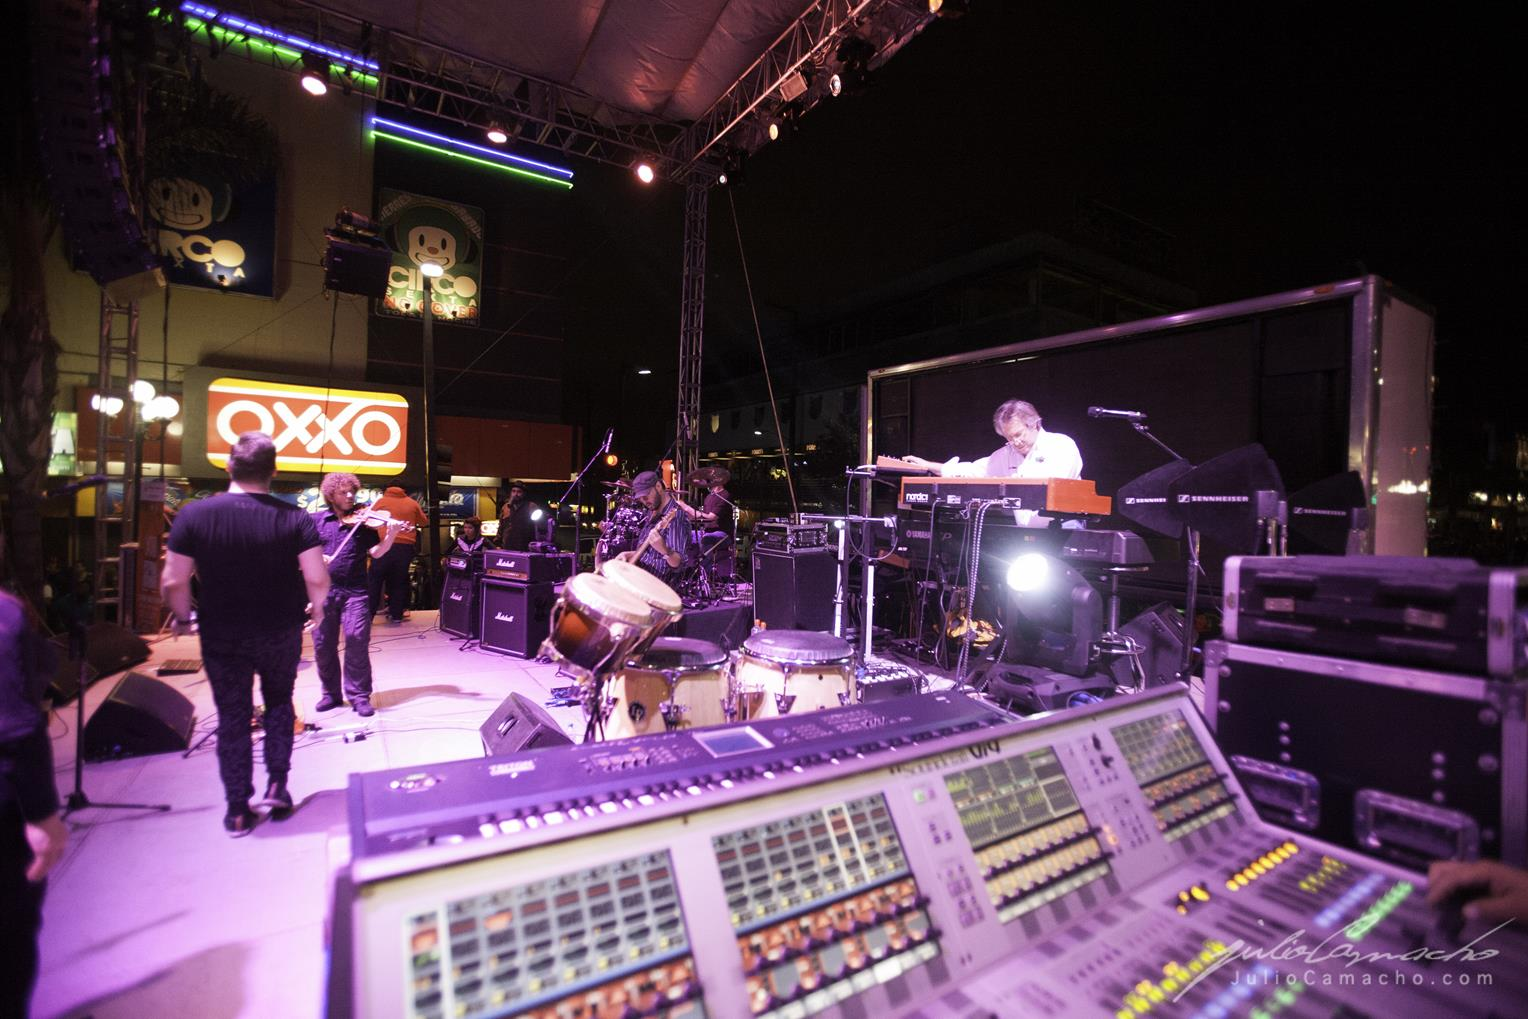 2014-10-30 31 CAST TOUR Ensenada y Tijuana - 1695 - www.Juli (Copy).jpg